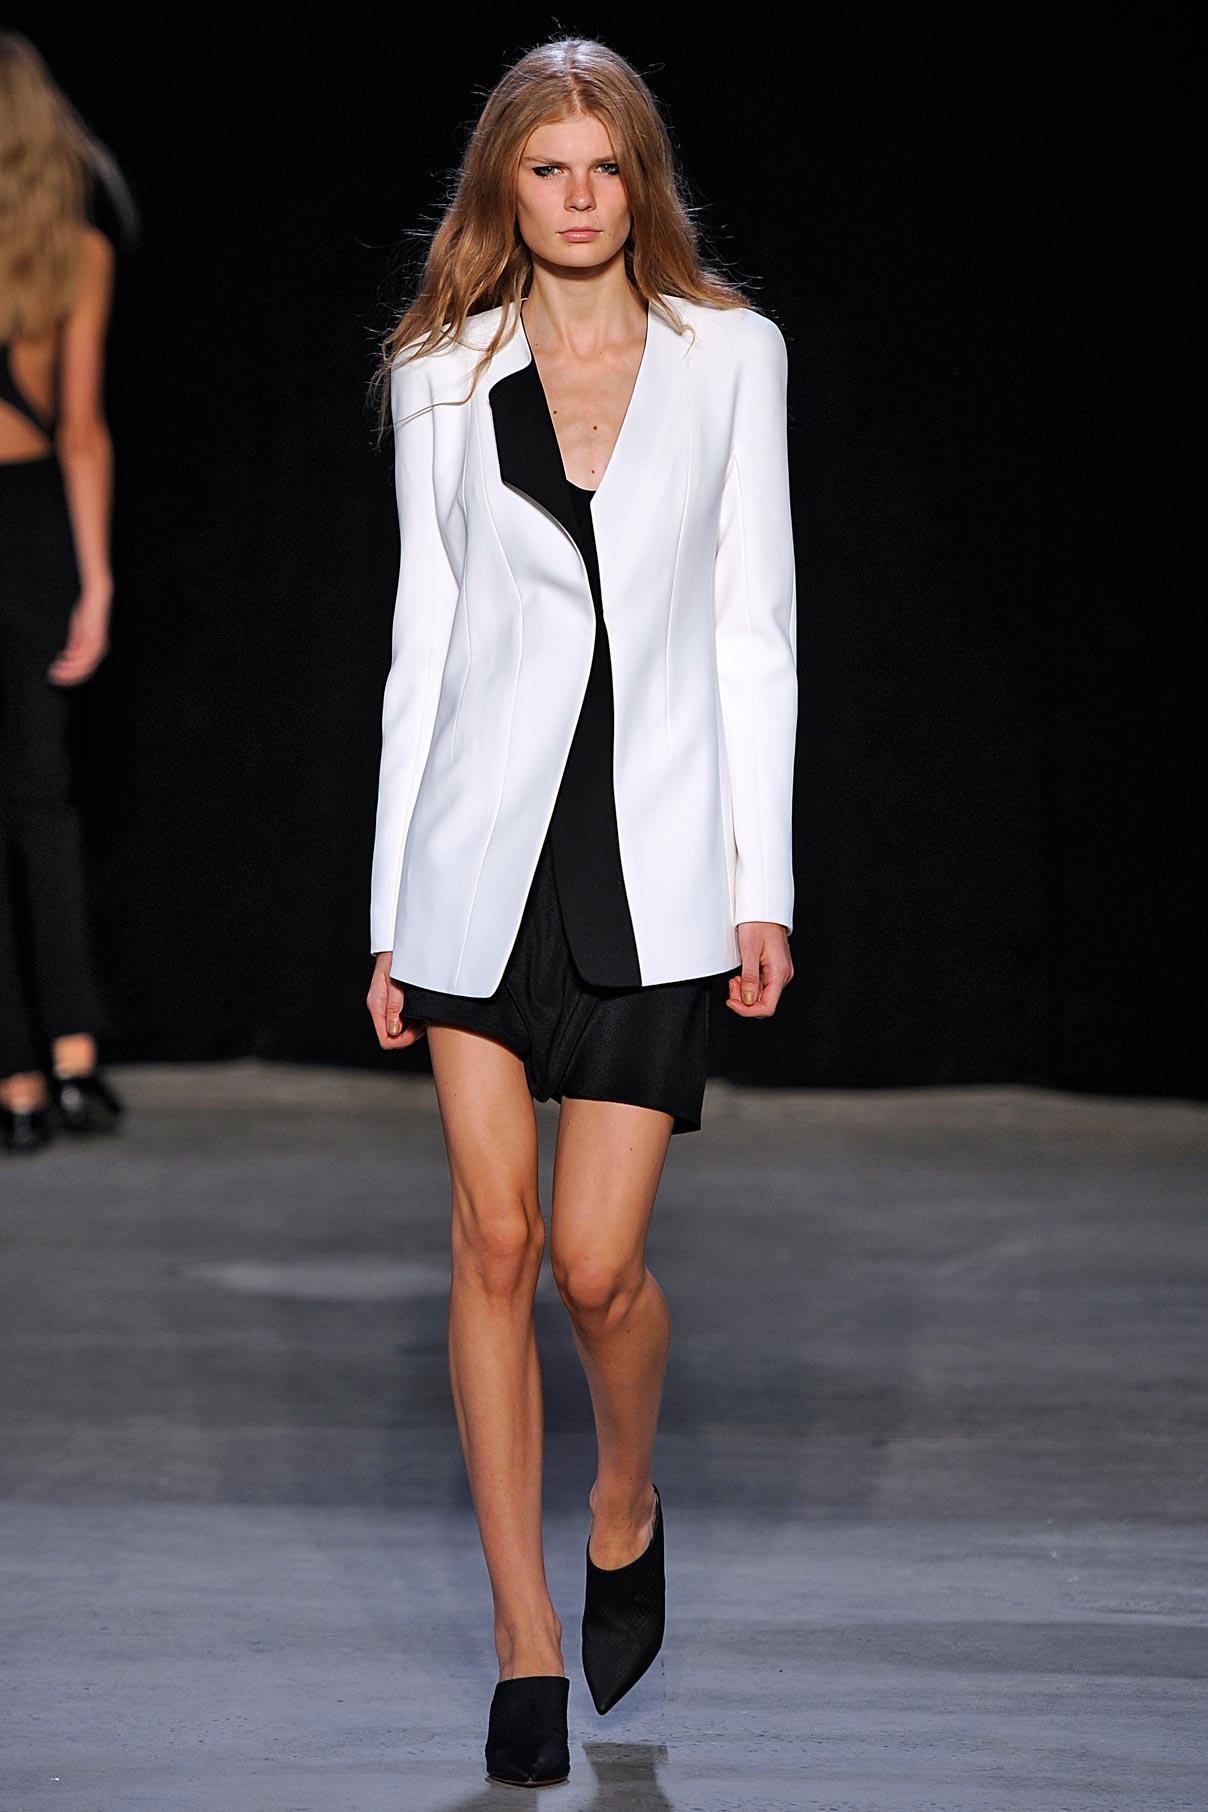 Look 6 White/black jacket with black kimono silk slip dress.